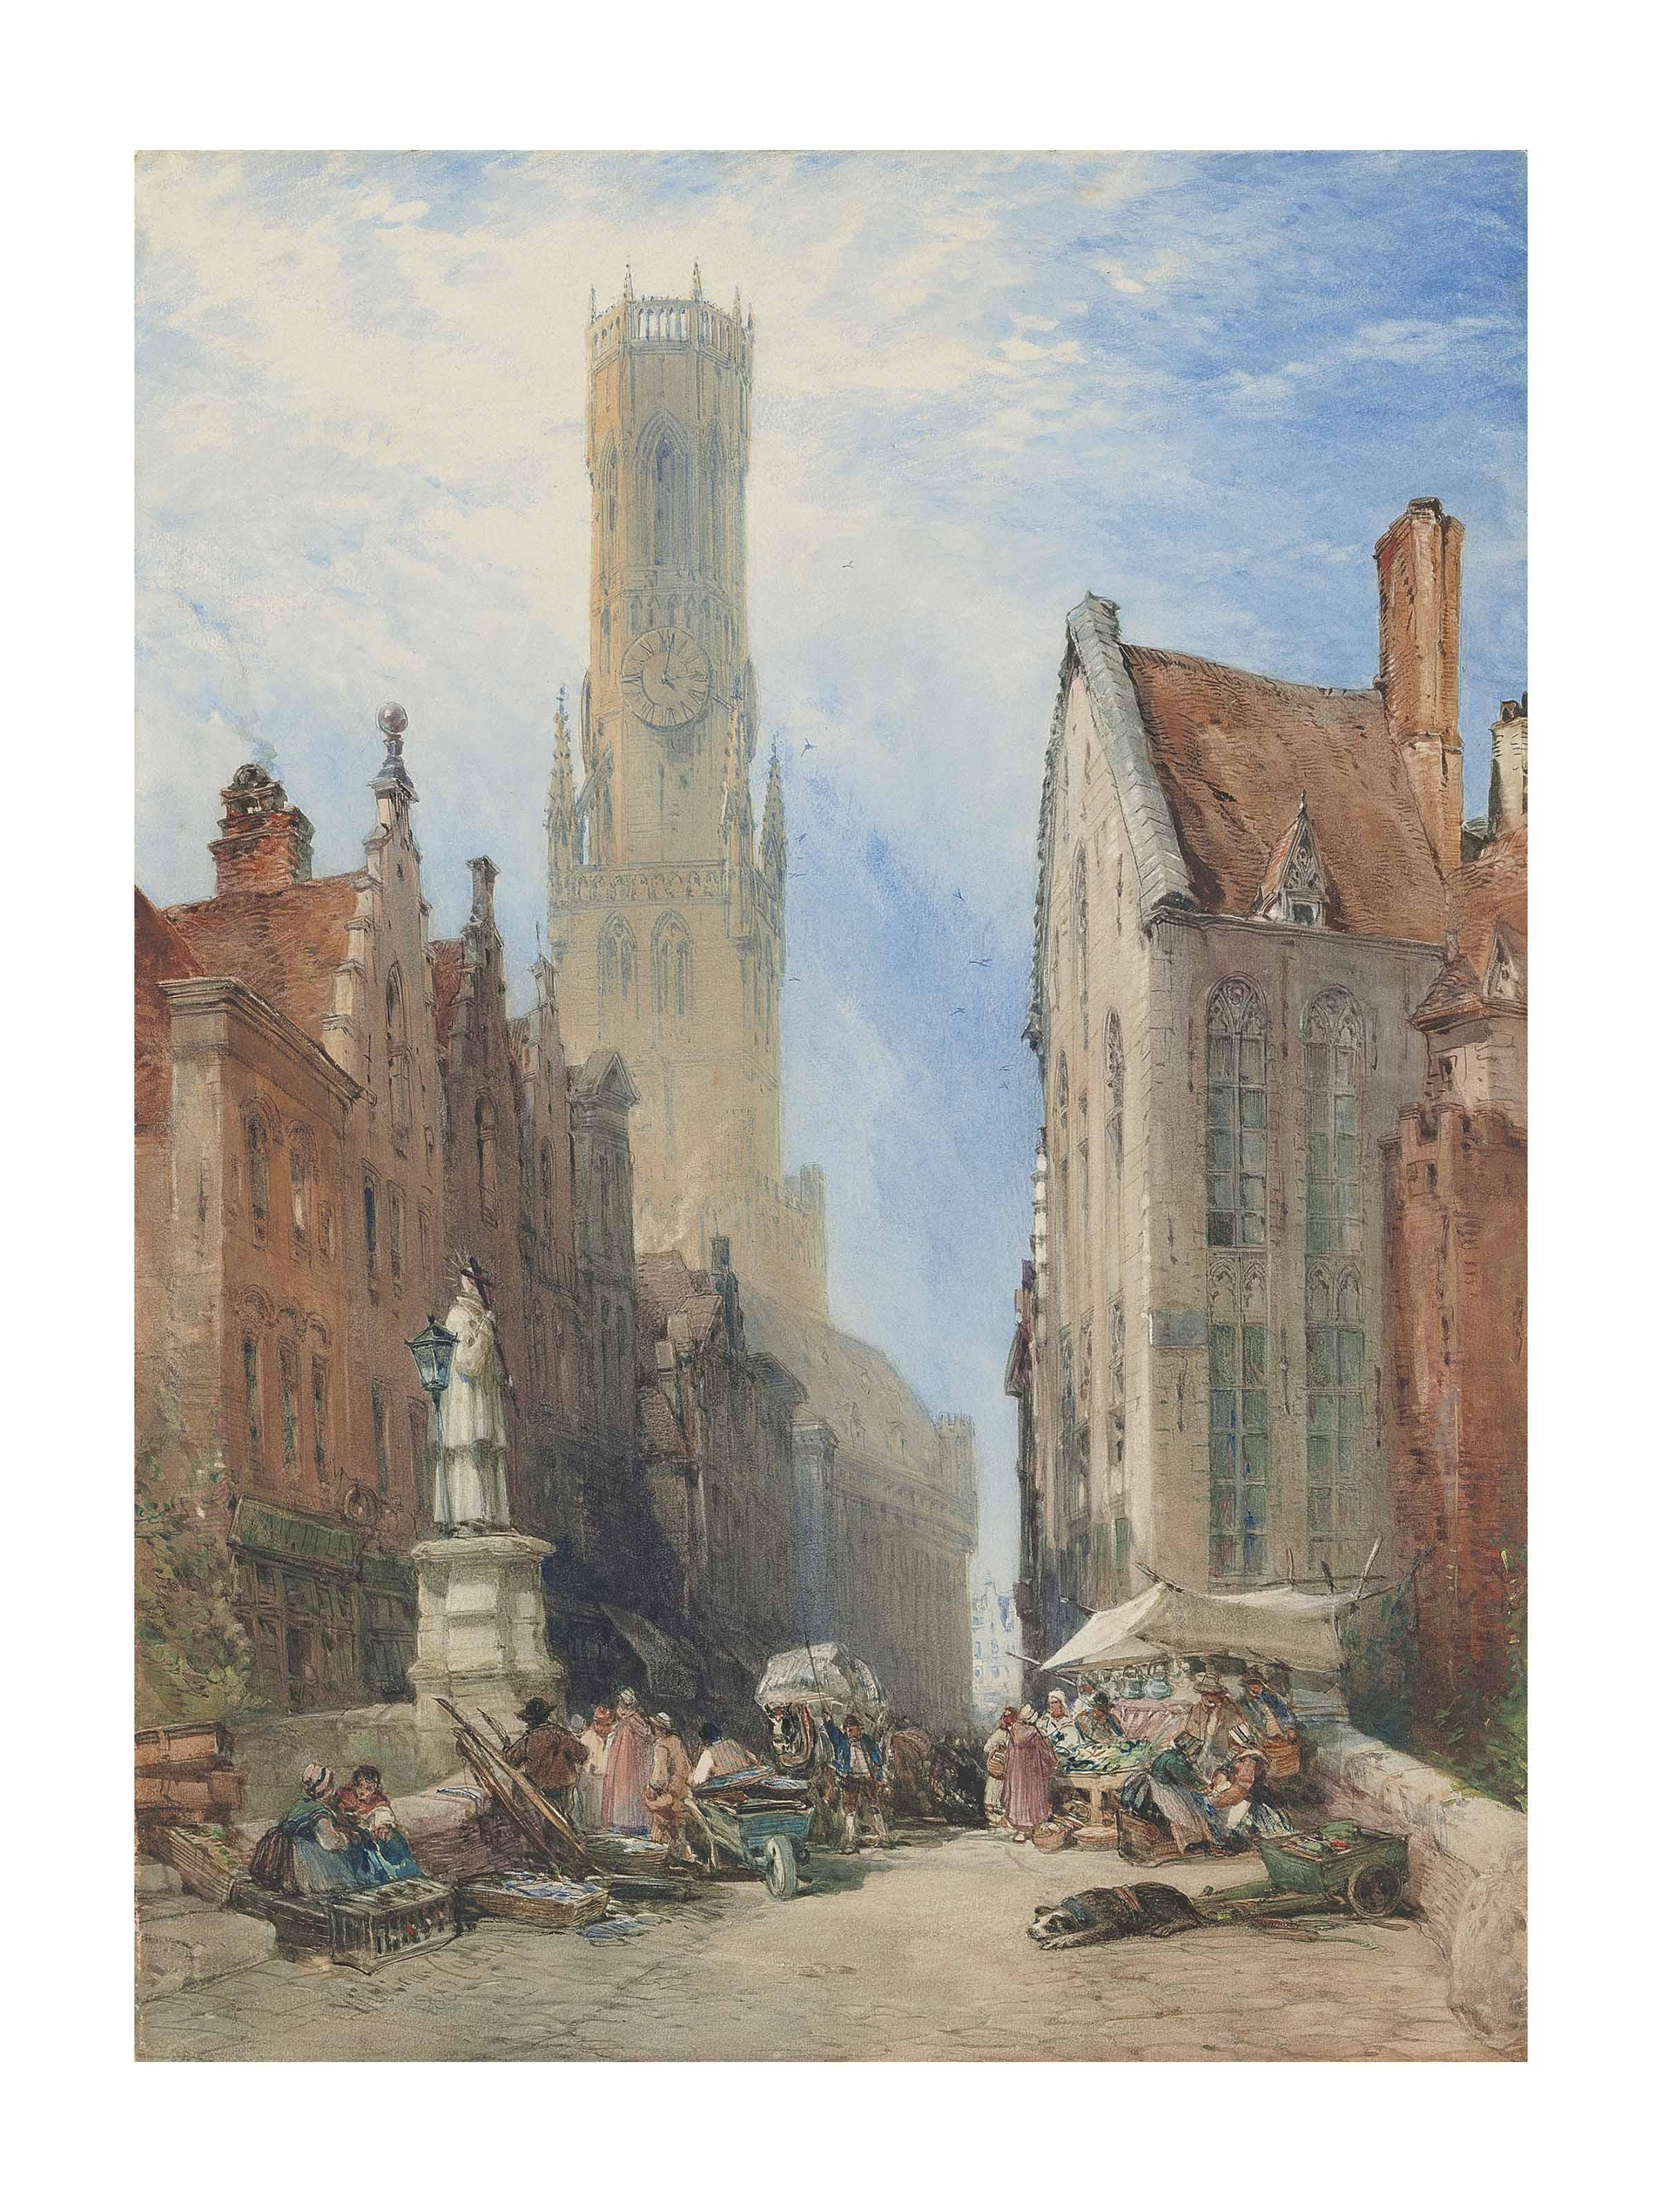 The Belfry at Bruges, Belgium